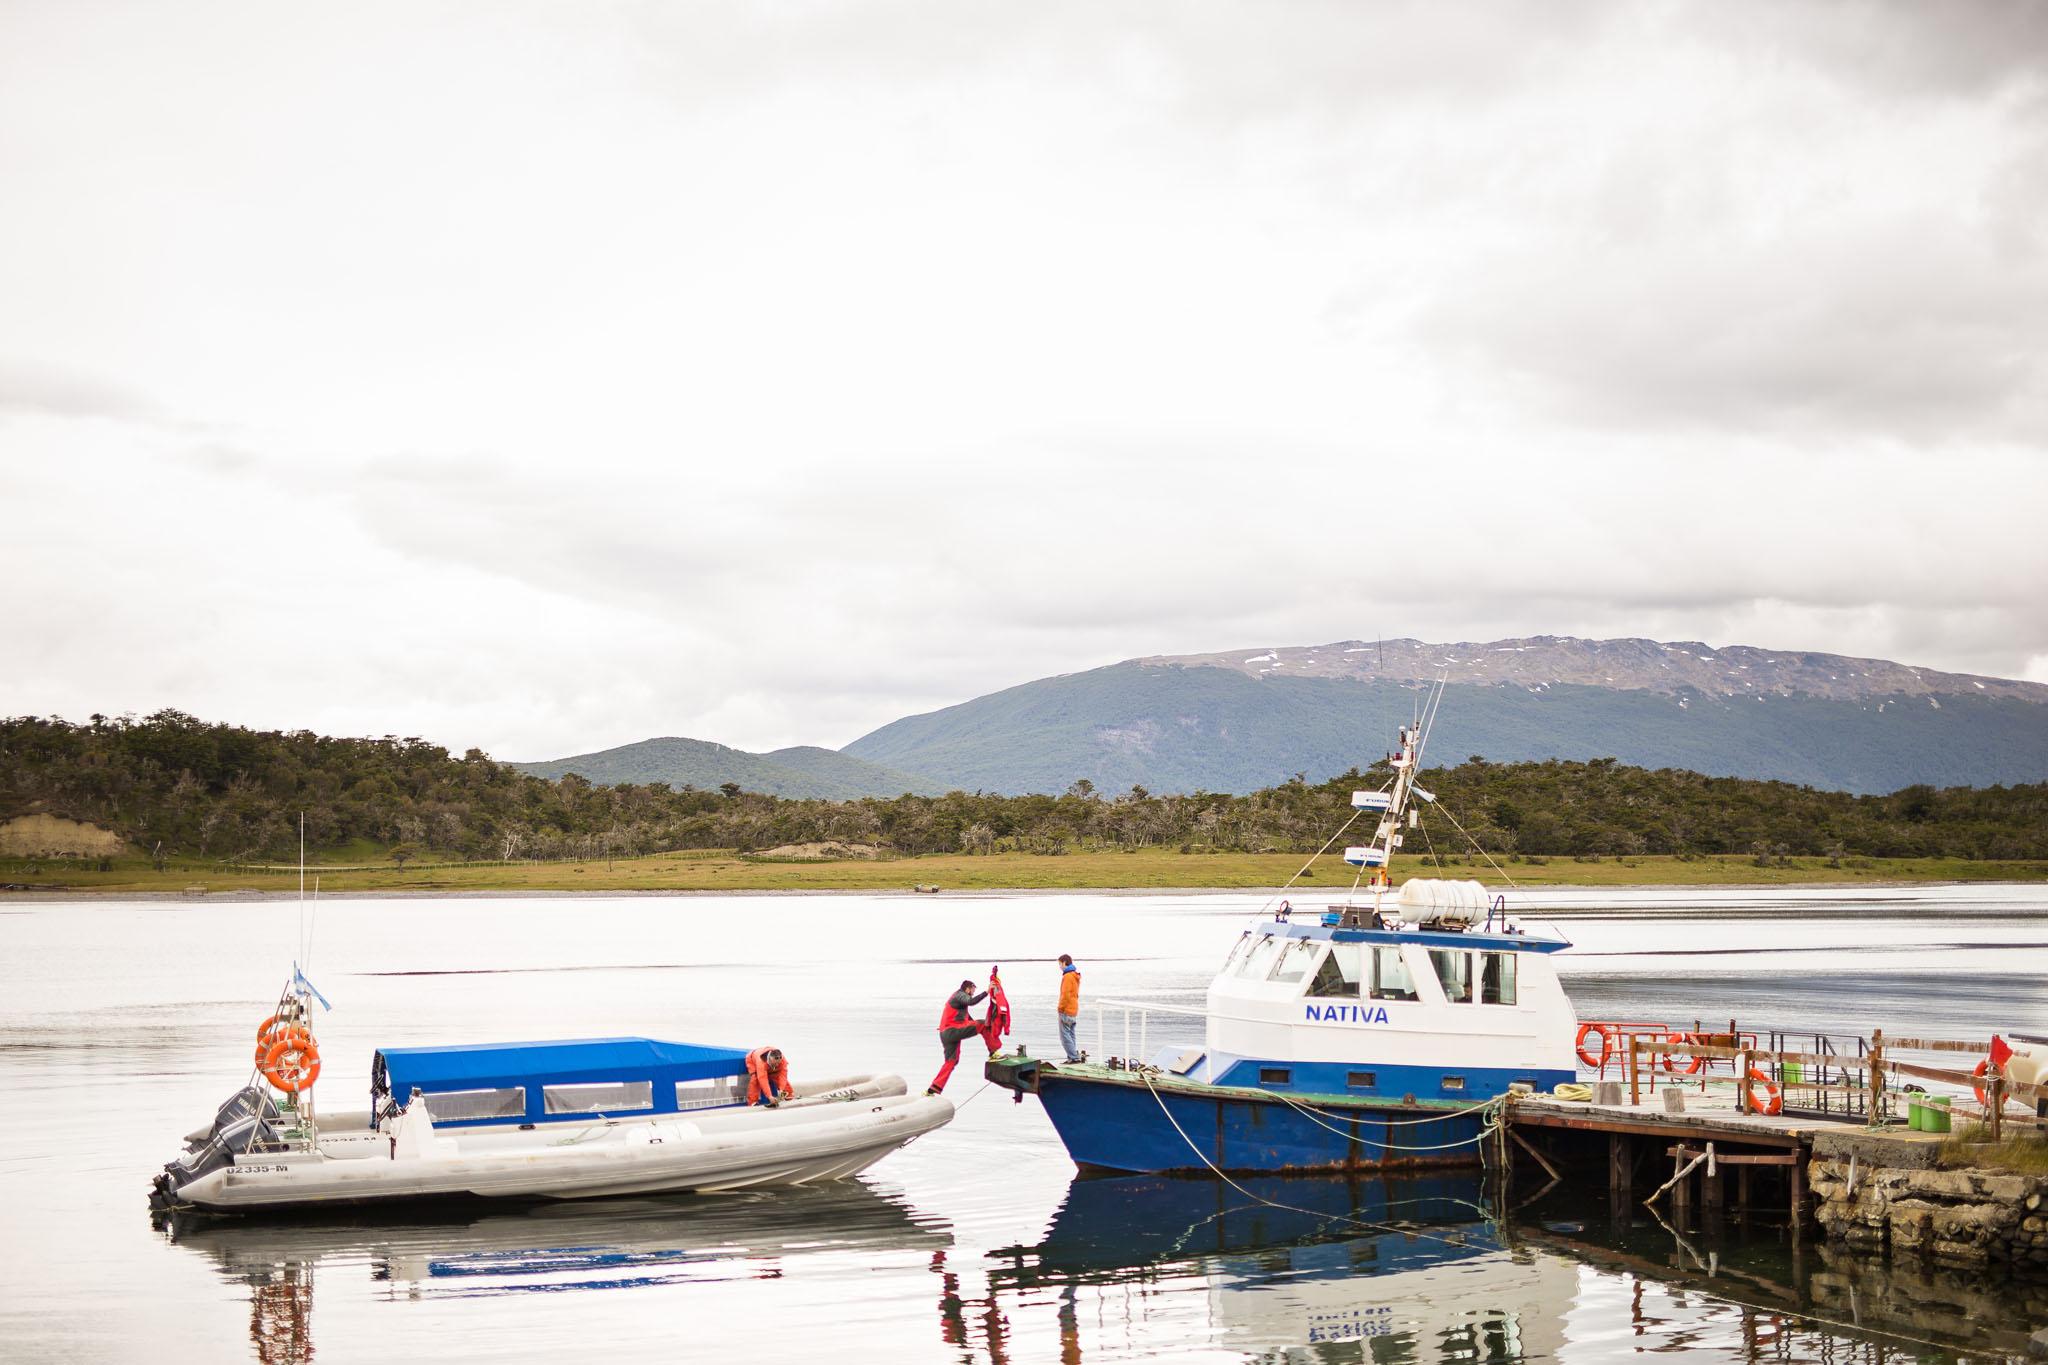 Wedding-travellers-ushuaia-argentina-estancia harberton